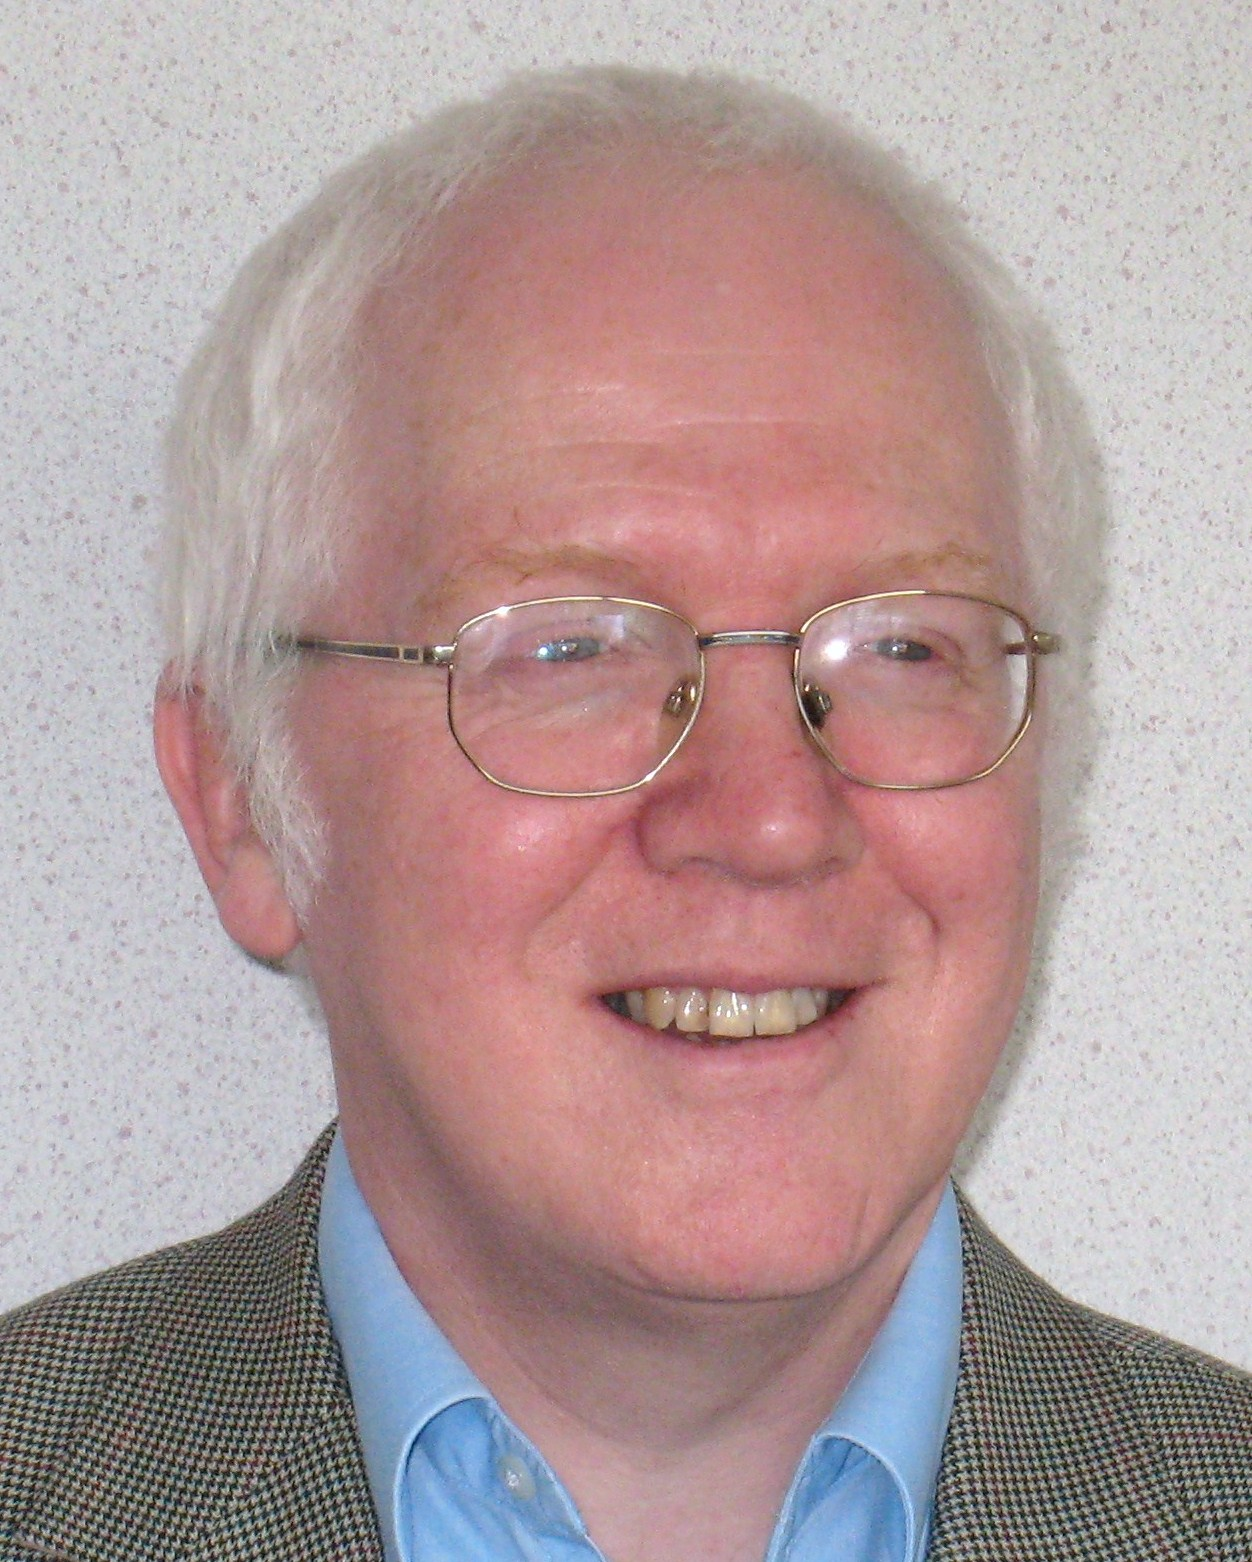 Steve Craggs of Lustratus Research